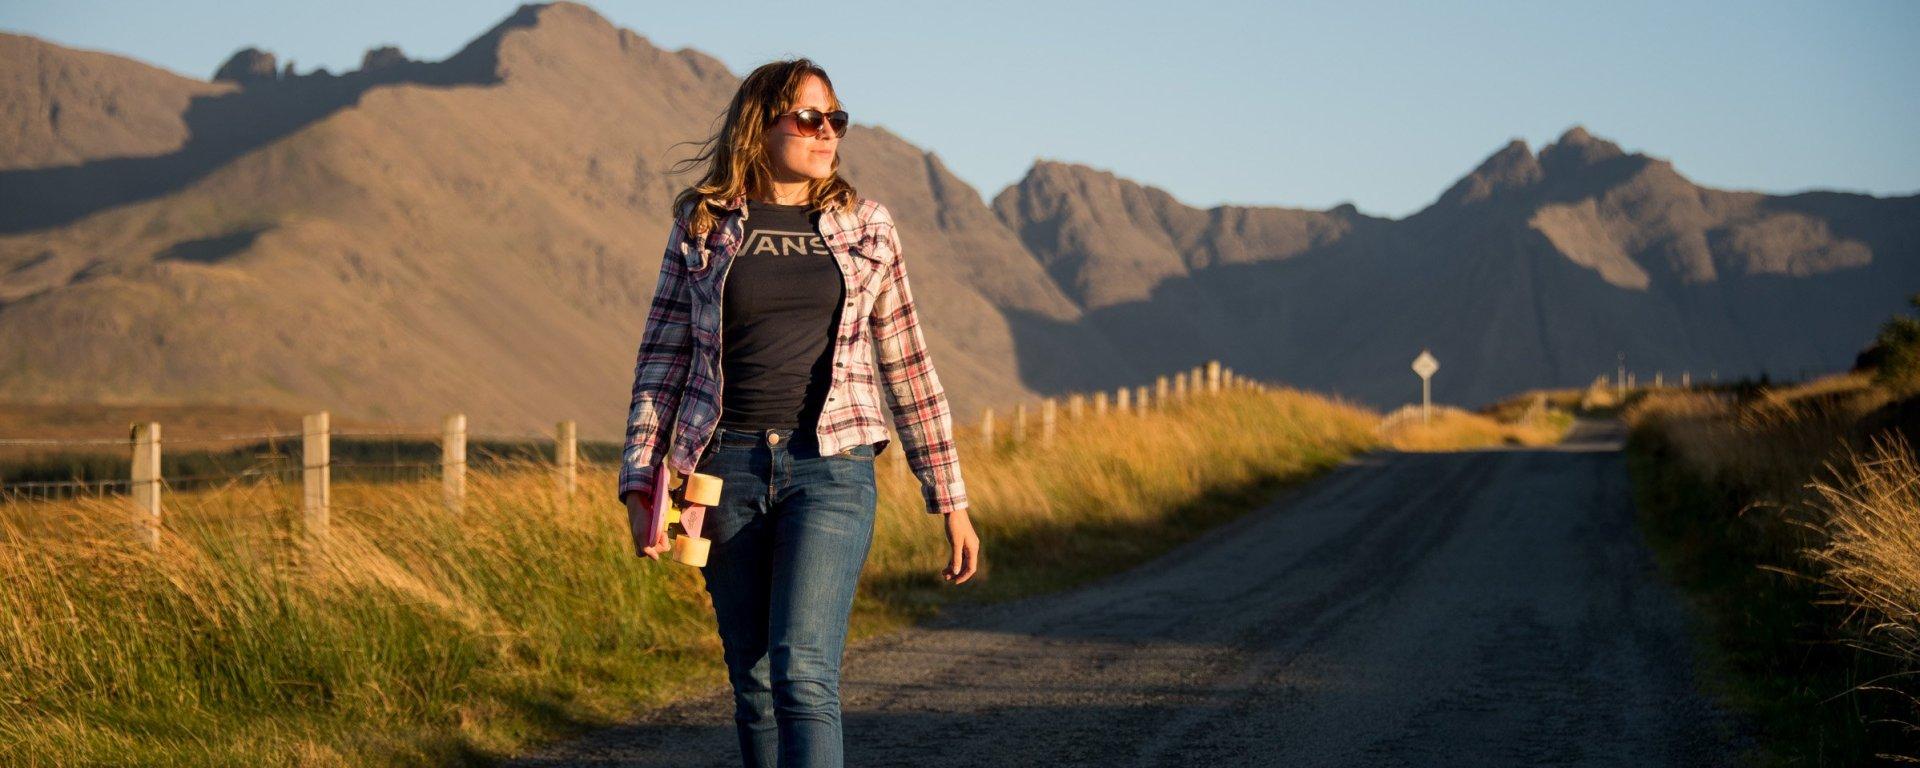 15 Epic Destinations for Solo Female Travel